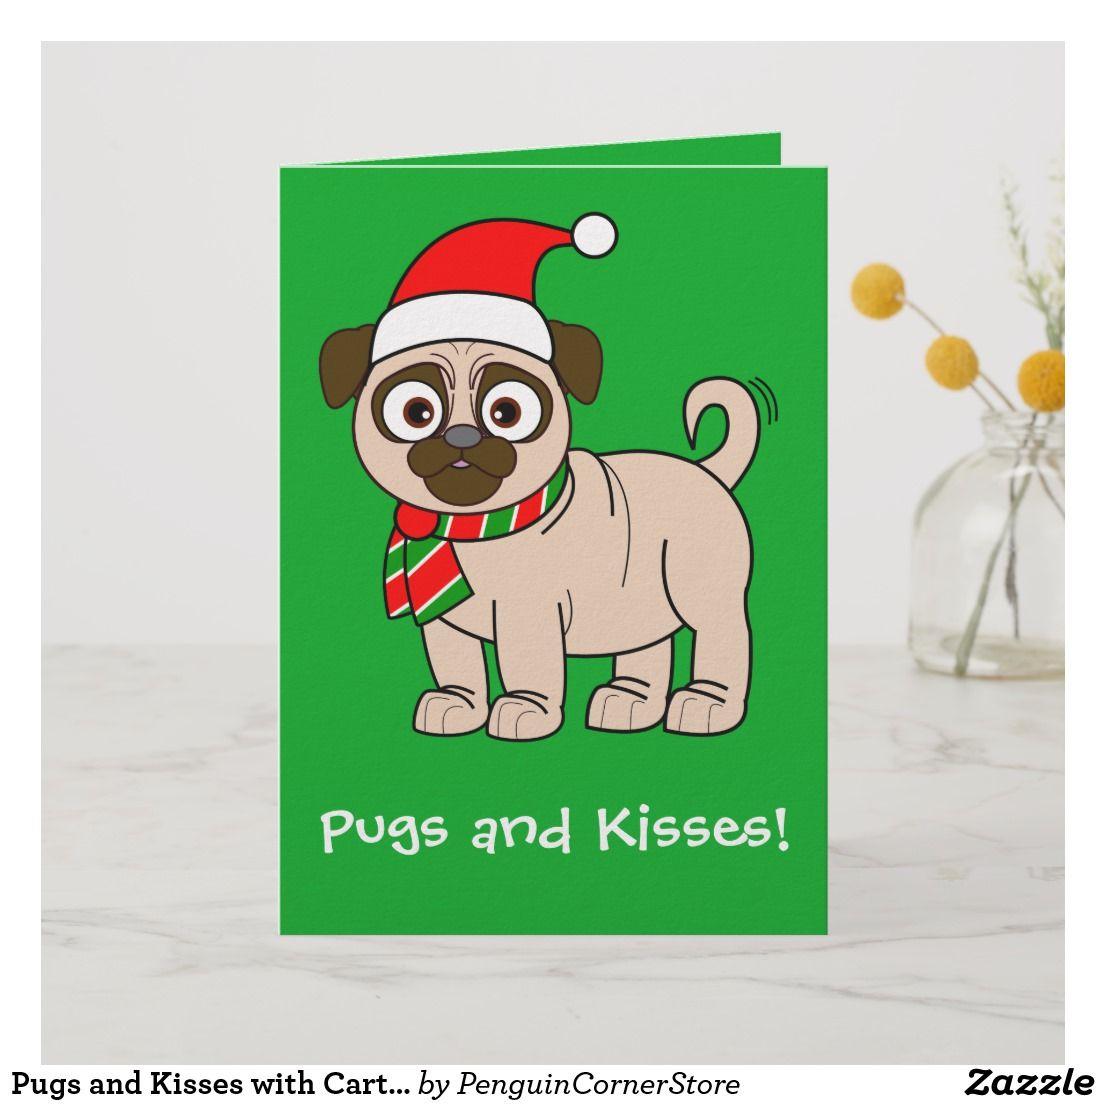 Pugs And Kisses With Cartoon Pug Holiday Card Zazzle Com Pugs